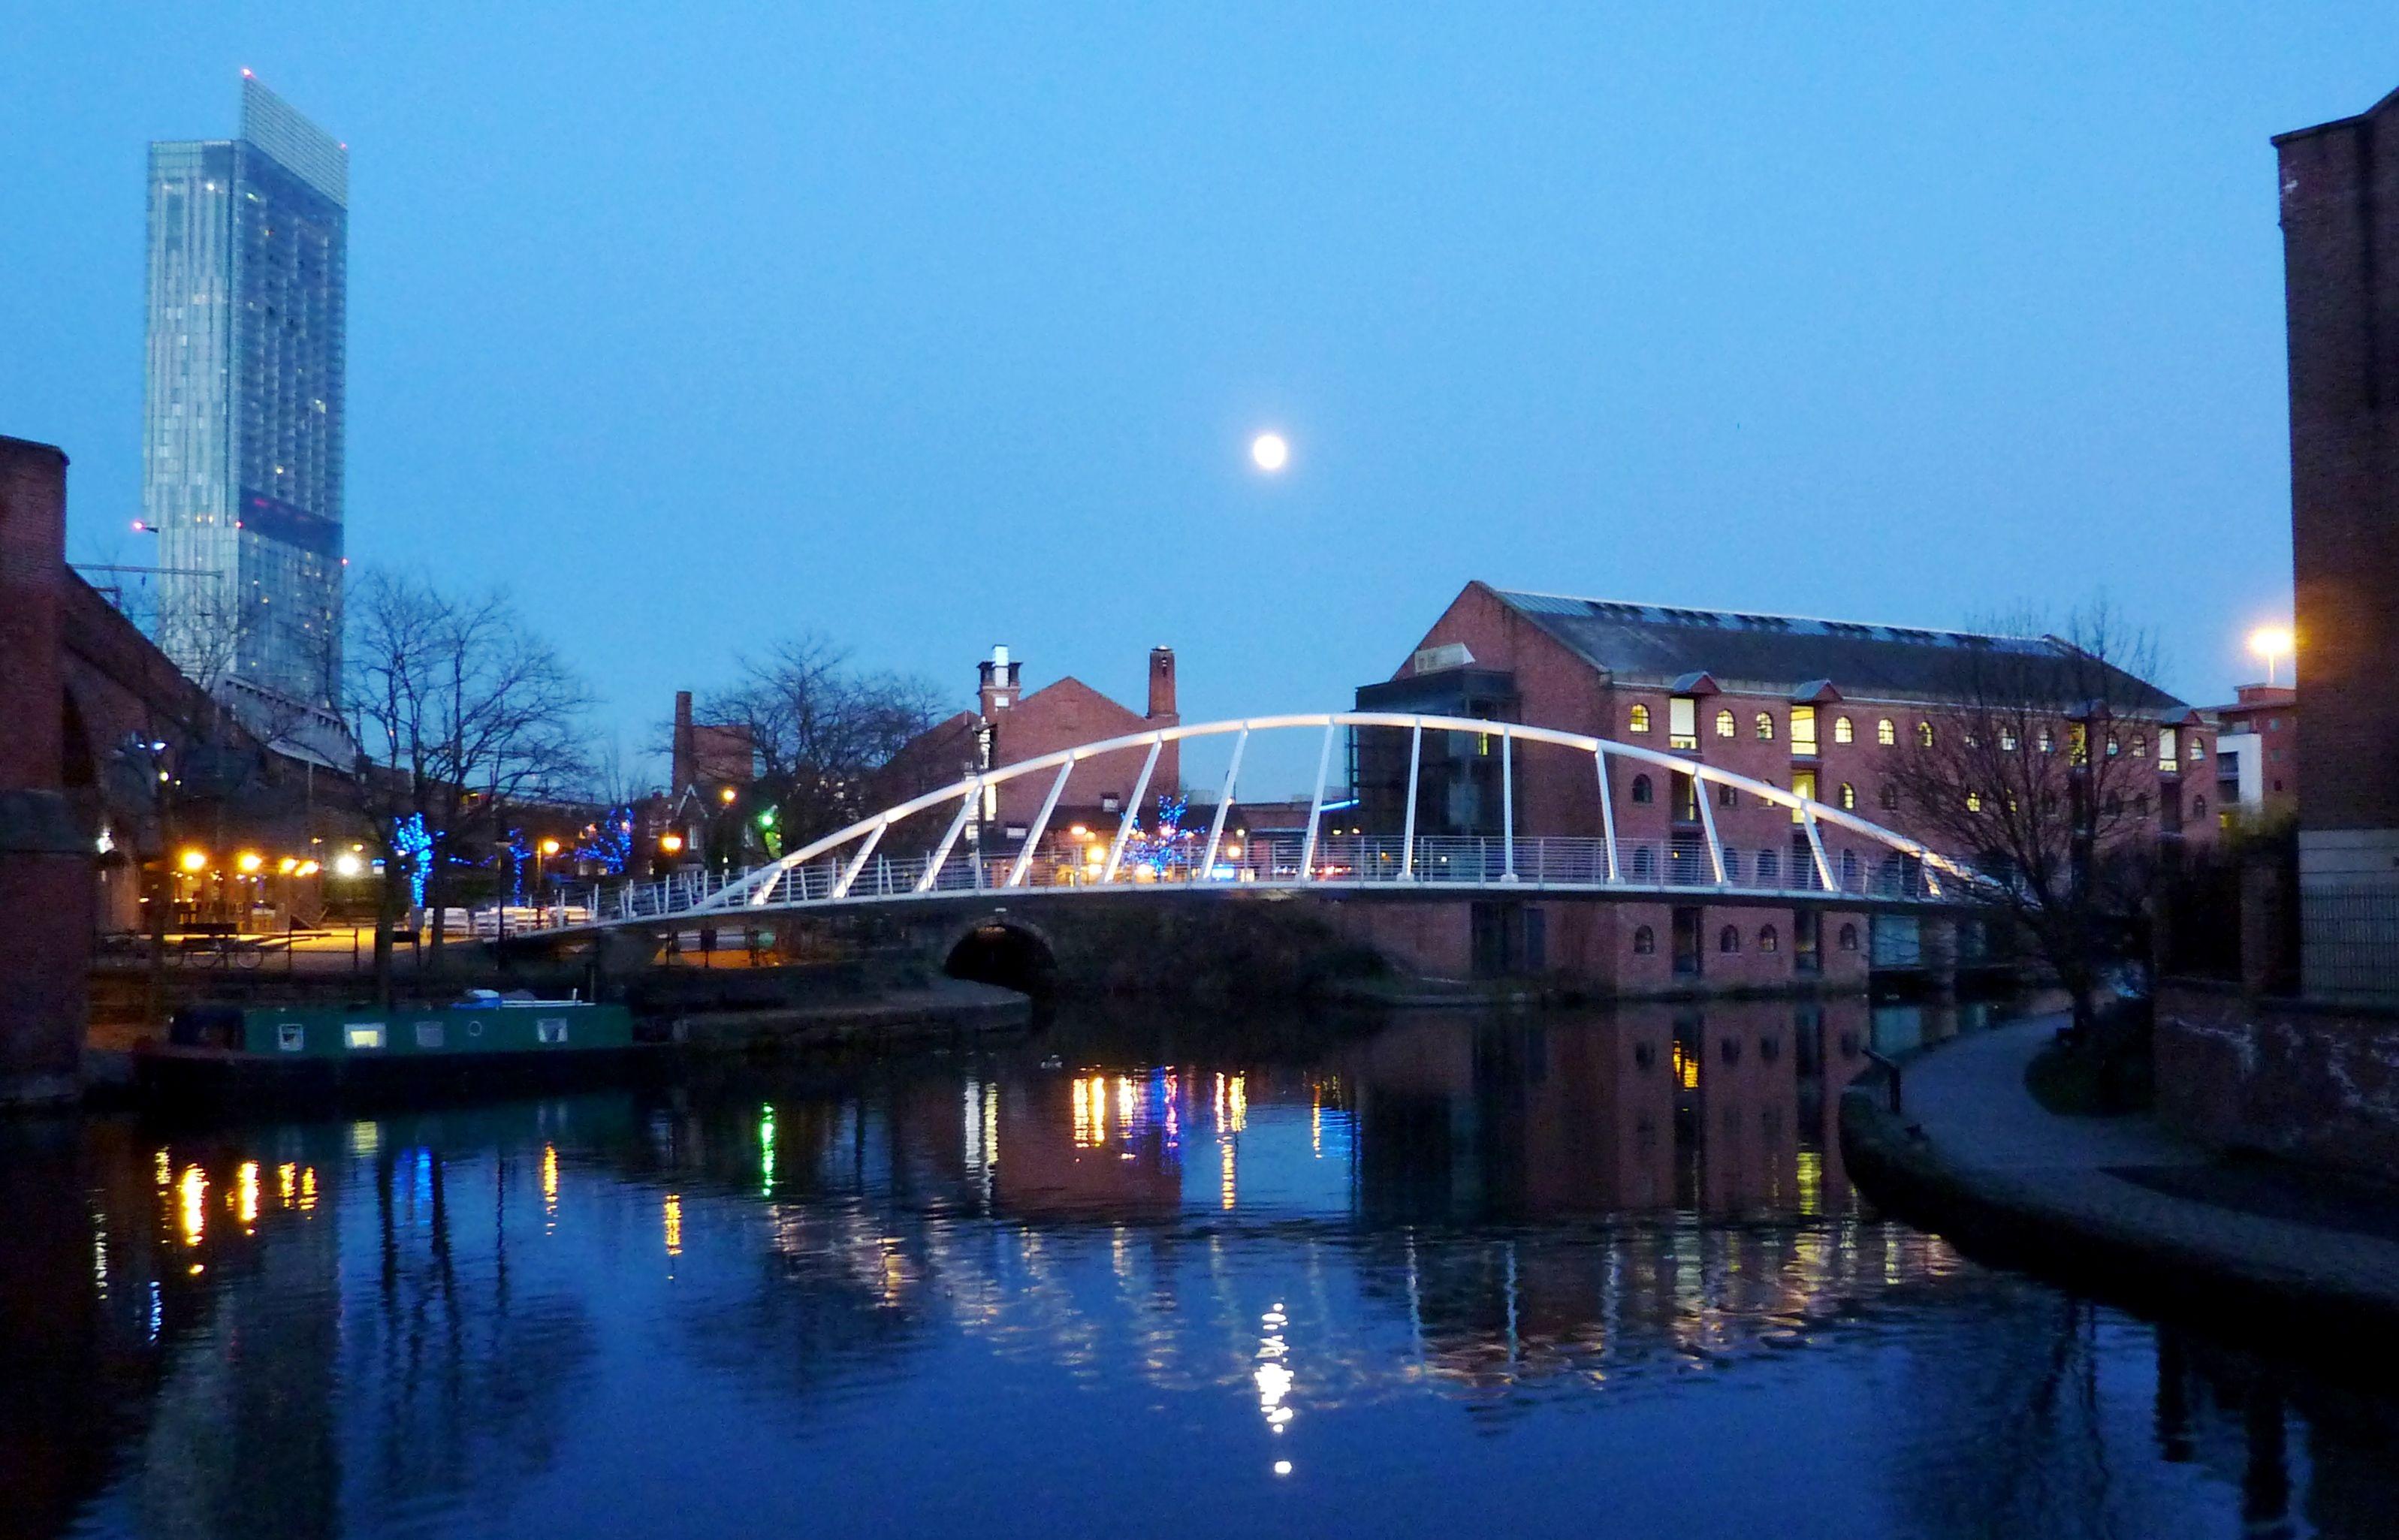 Merchants Bridge #Castlefield As seen from #PotatoWharf #BridgewaterCanal